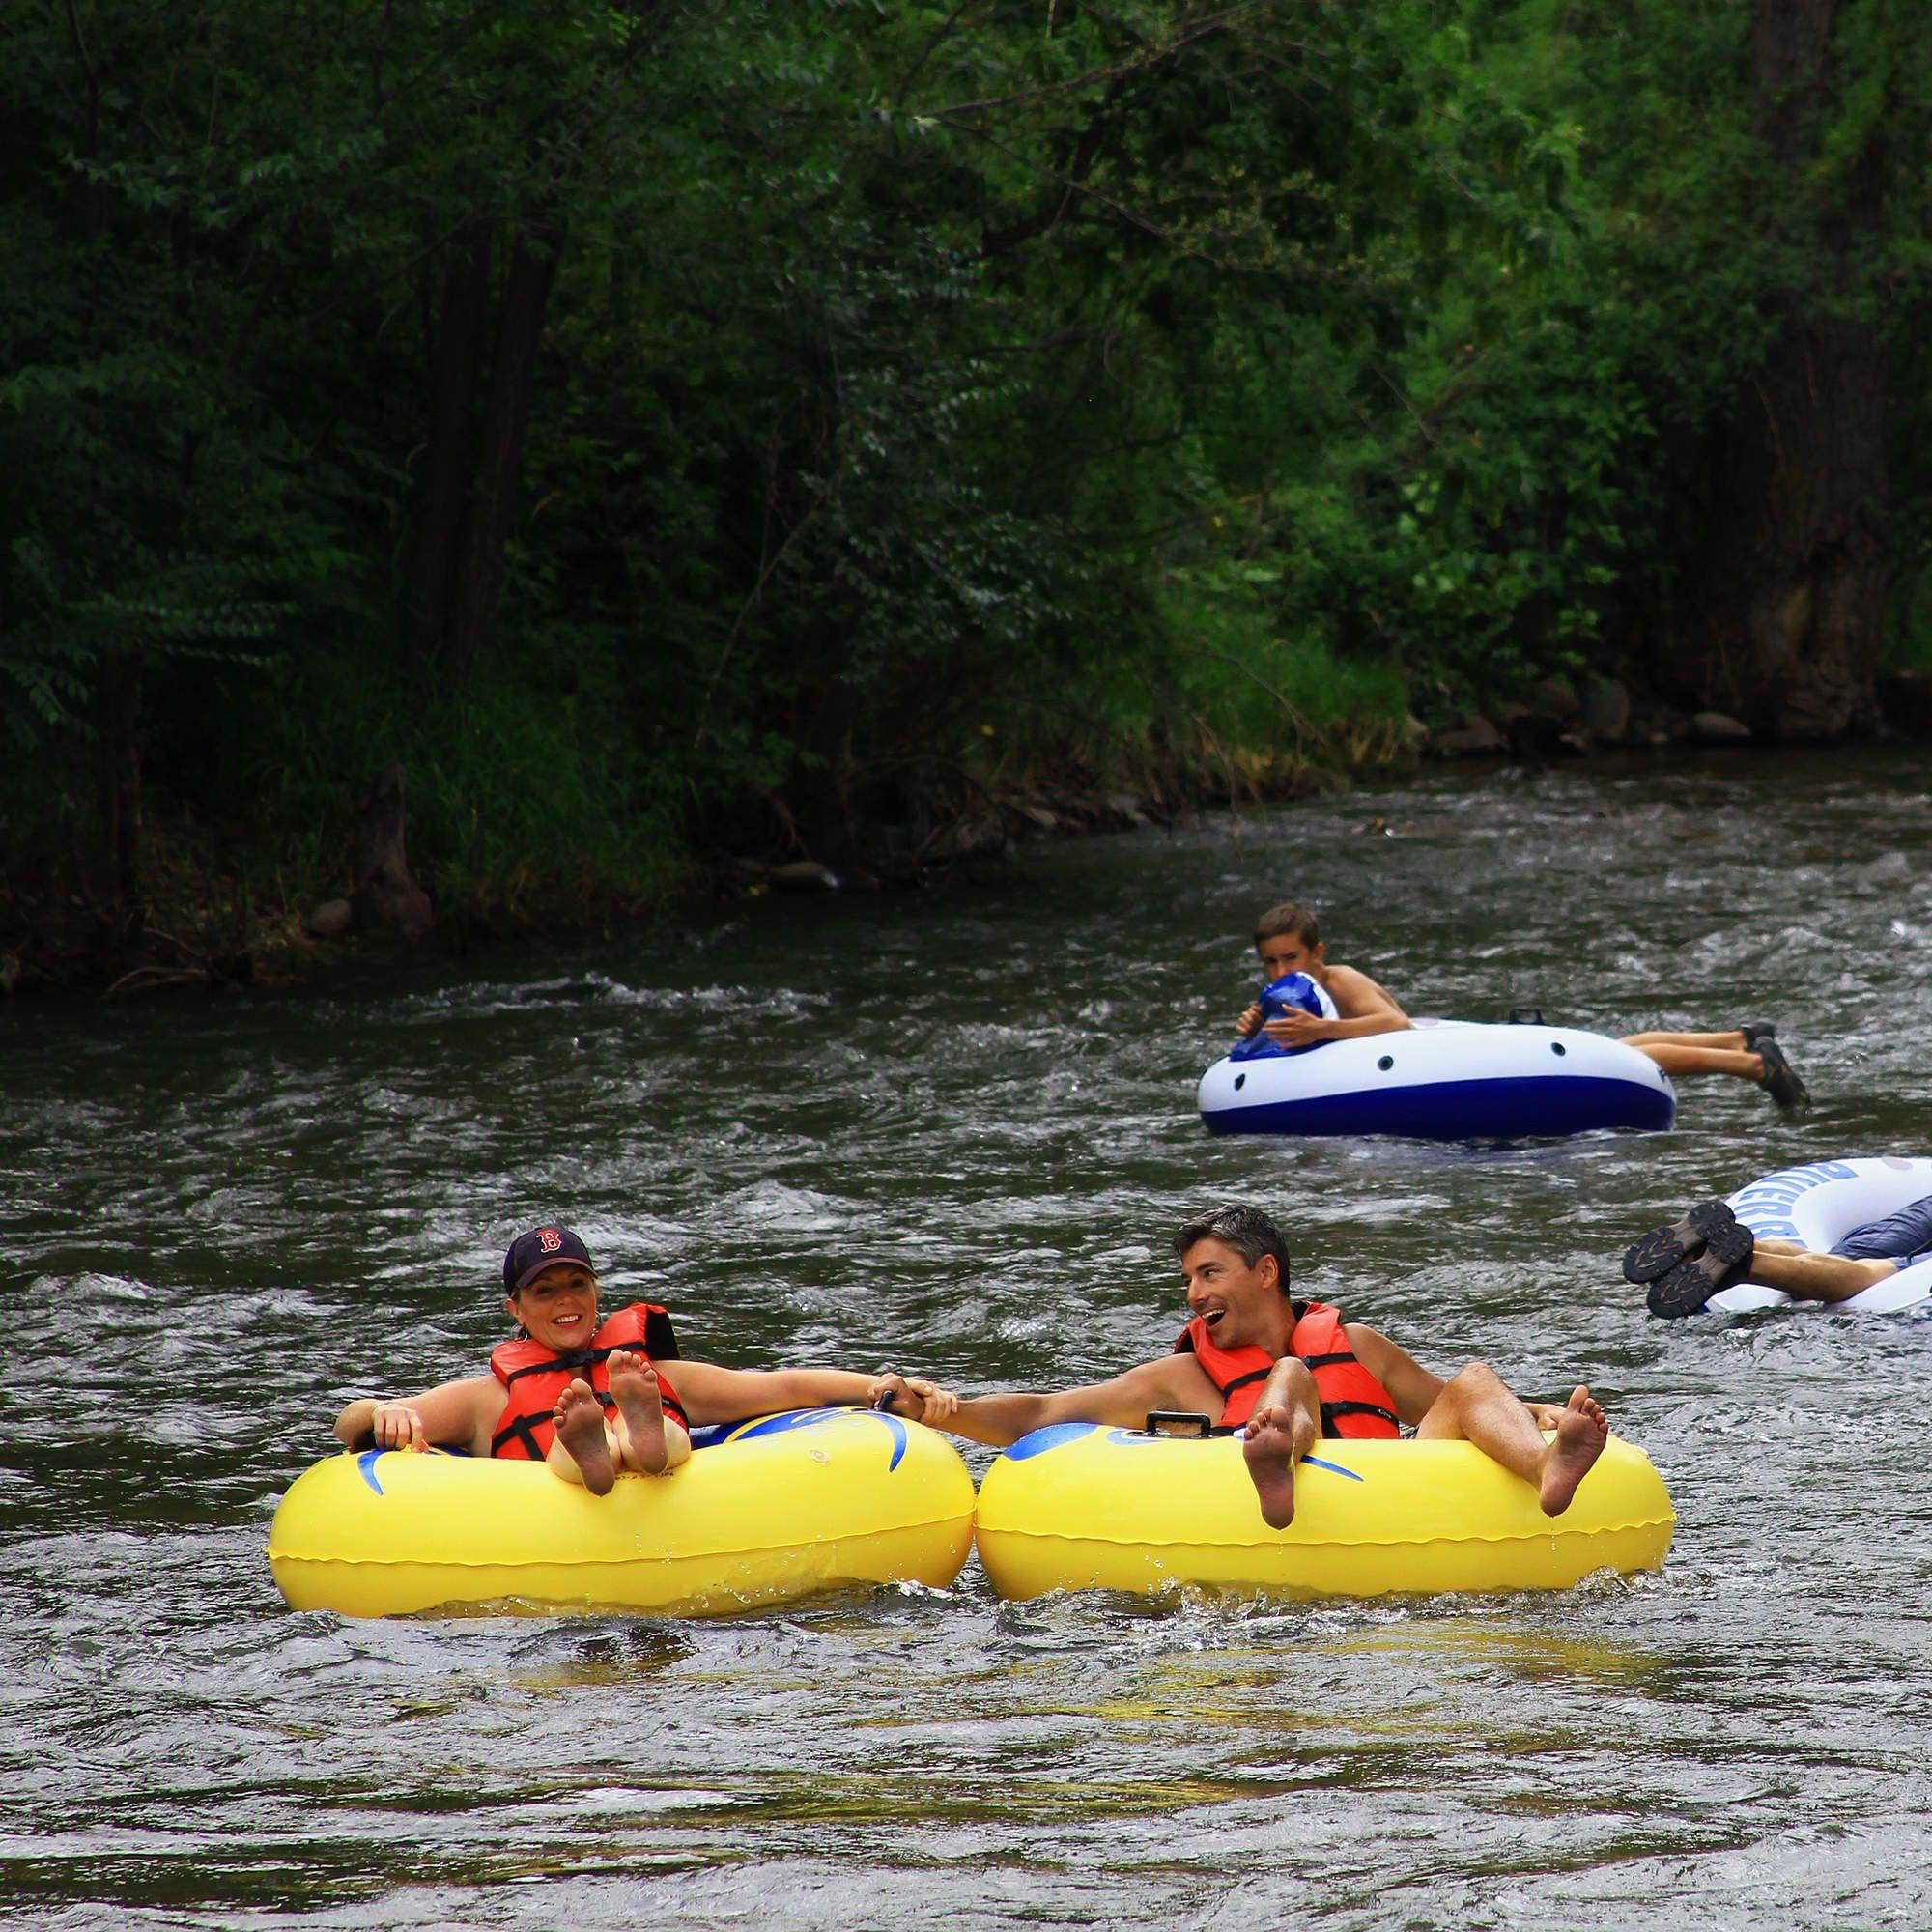 11 totally free places to exercise in denver denver colorado